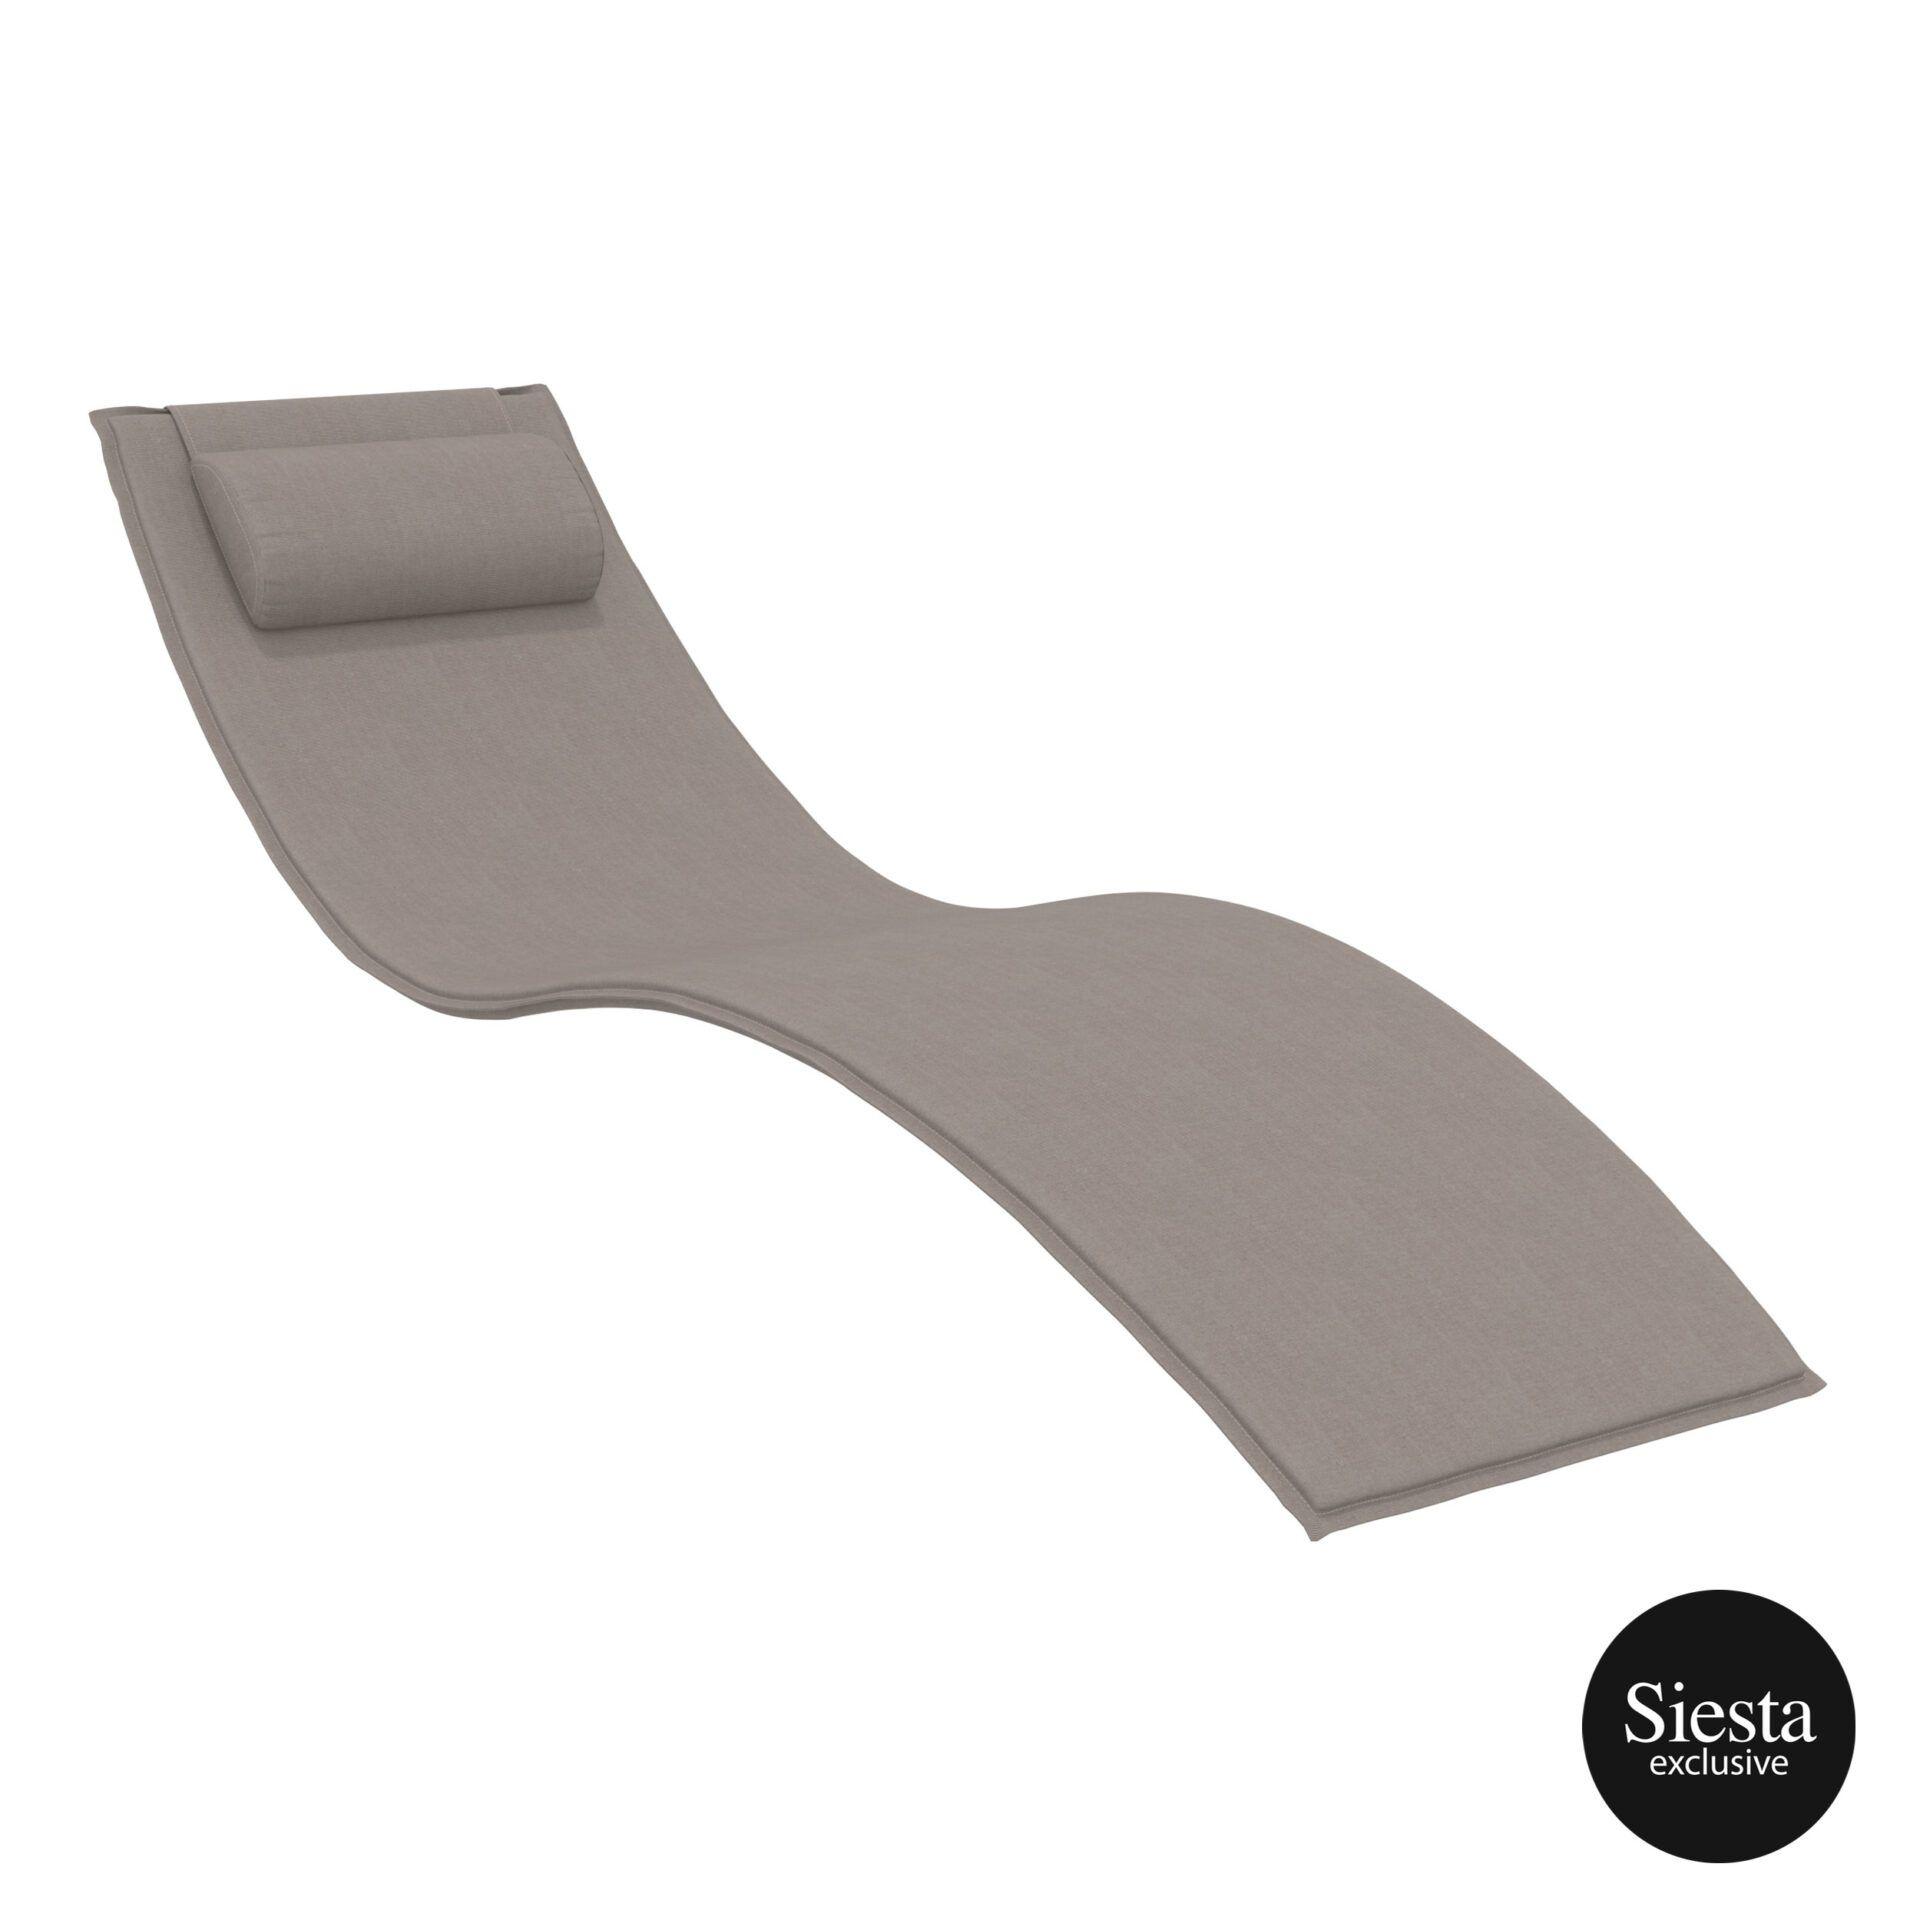 outdoor polypropylene slim sunlounger pillow cushion brown cushion